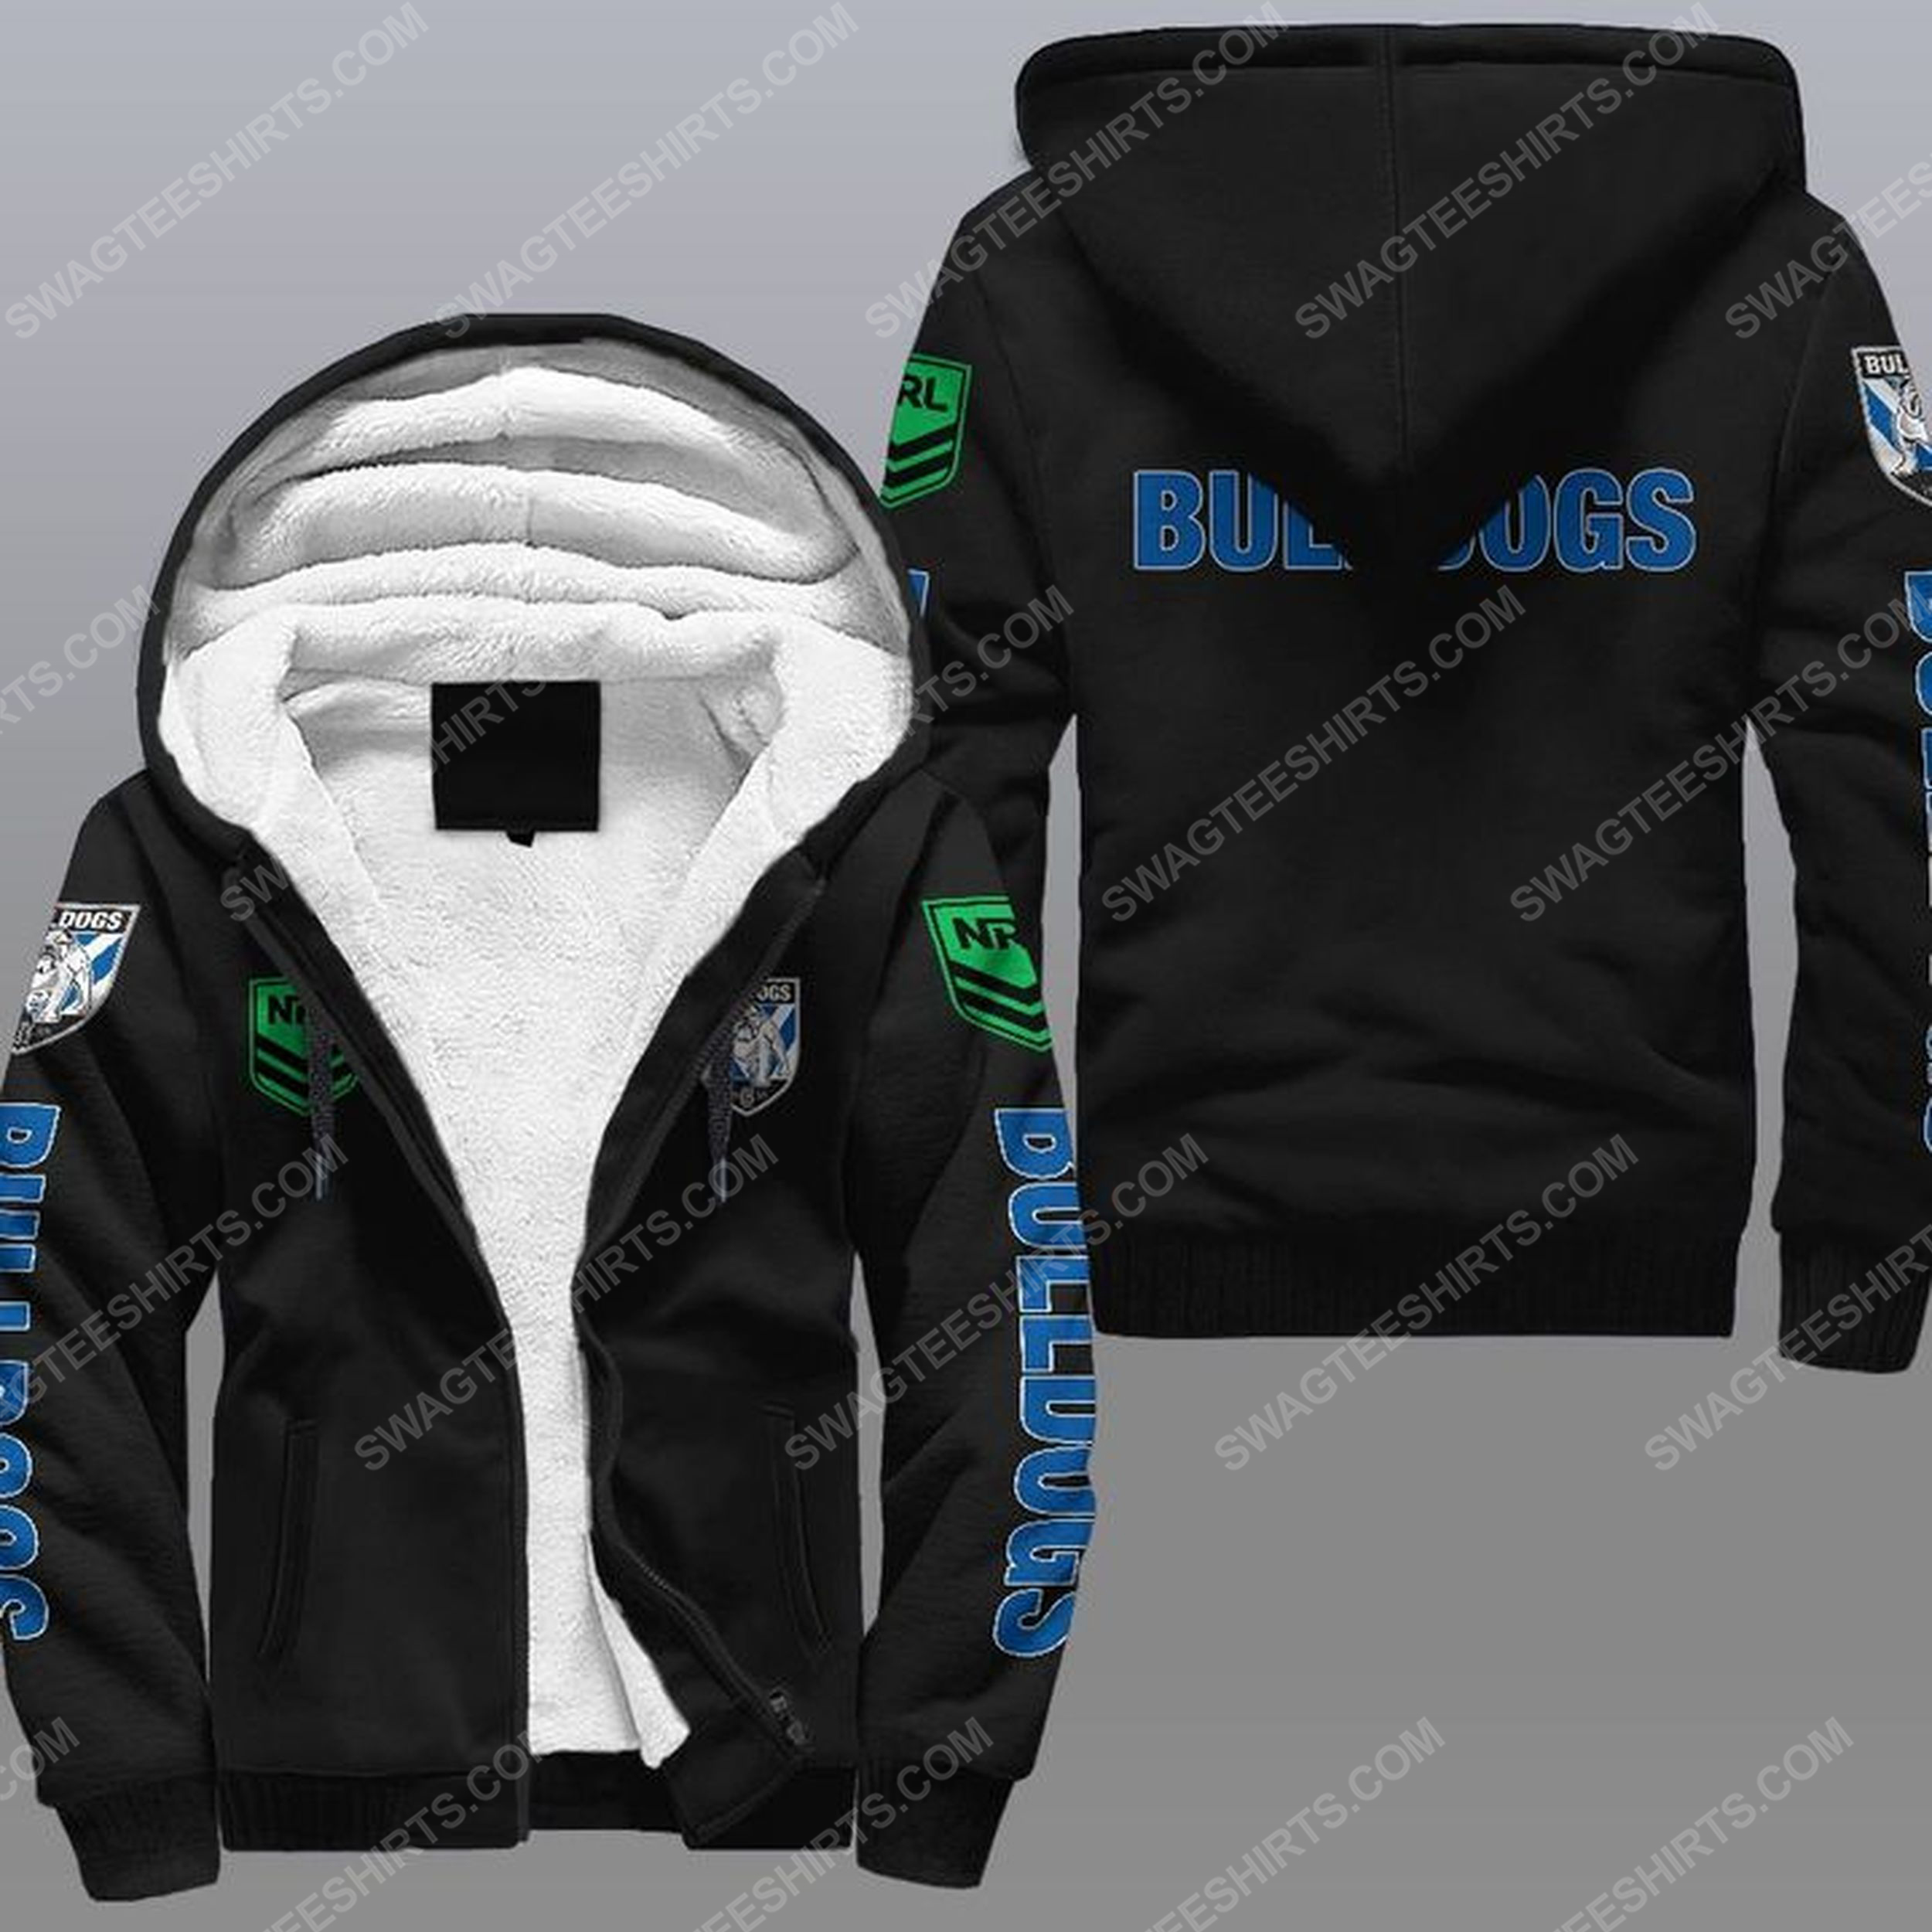 Canterbury-bankstown bulldogs all over print fleece hoodie - black 1